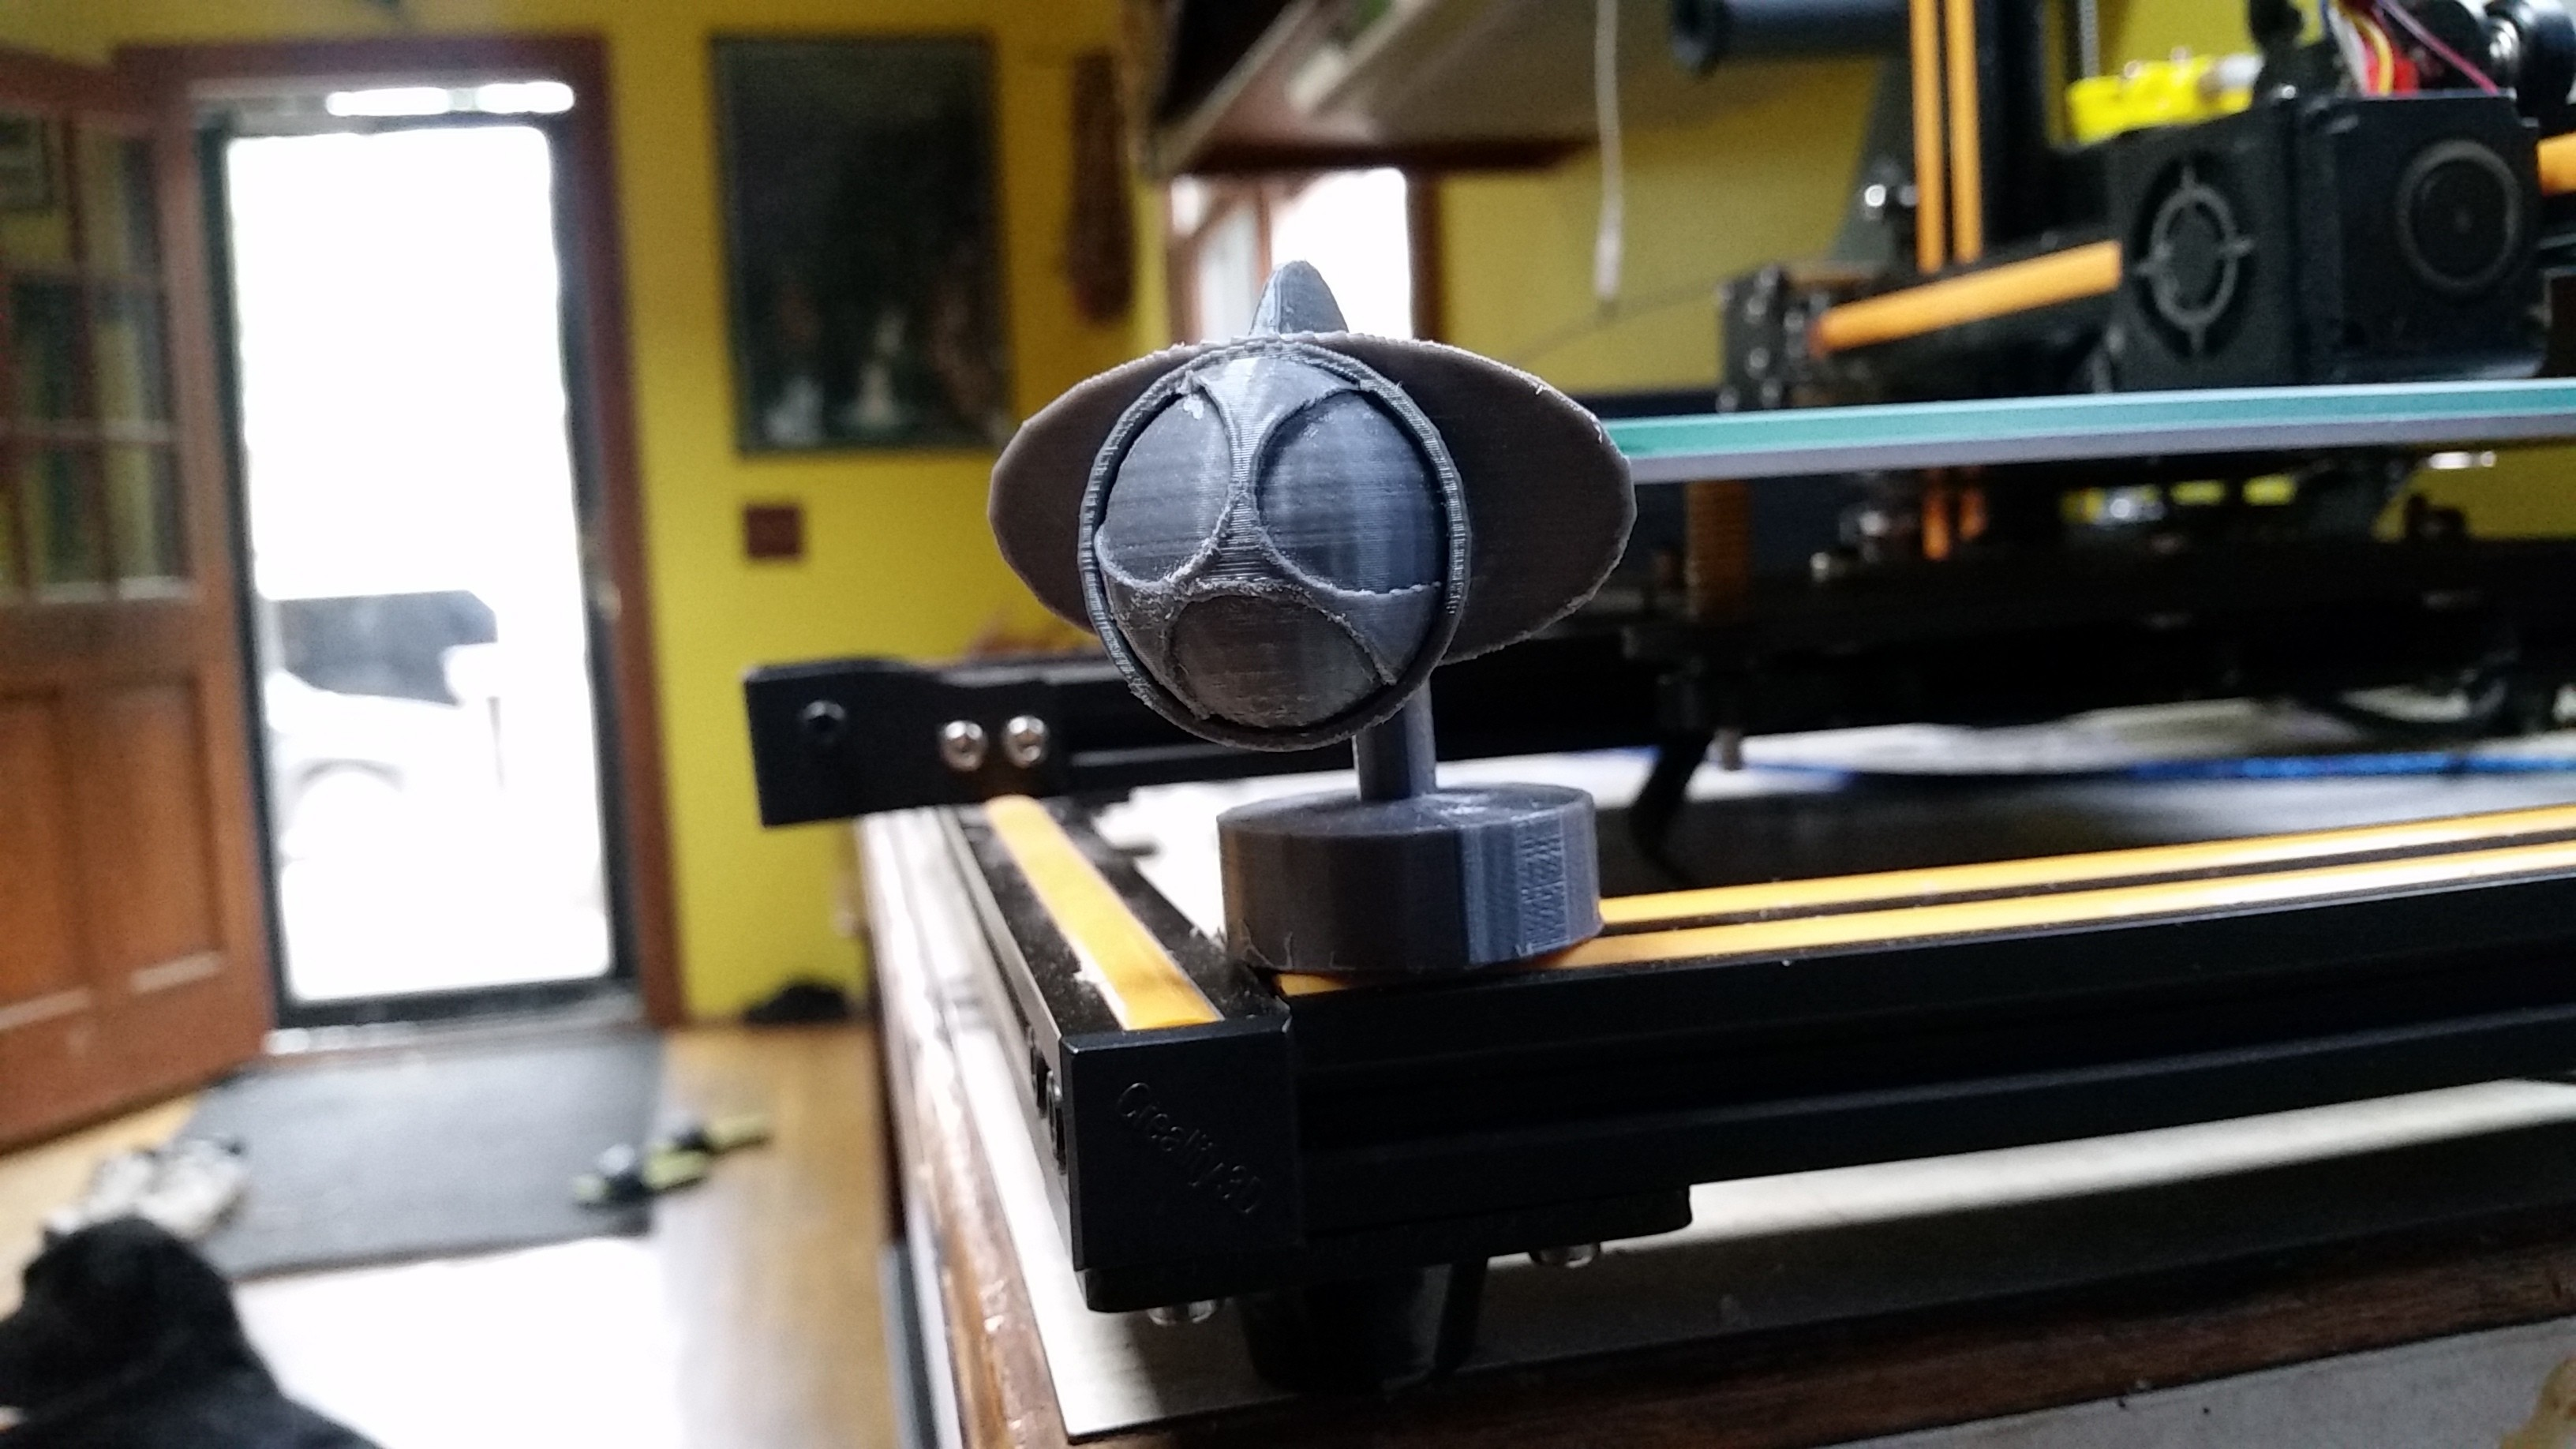 20180610_130931.jpg Download STL file war of the worlds alien  • 3D printing template, platt980